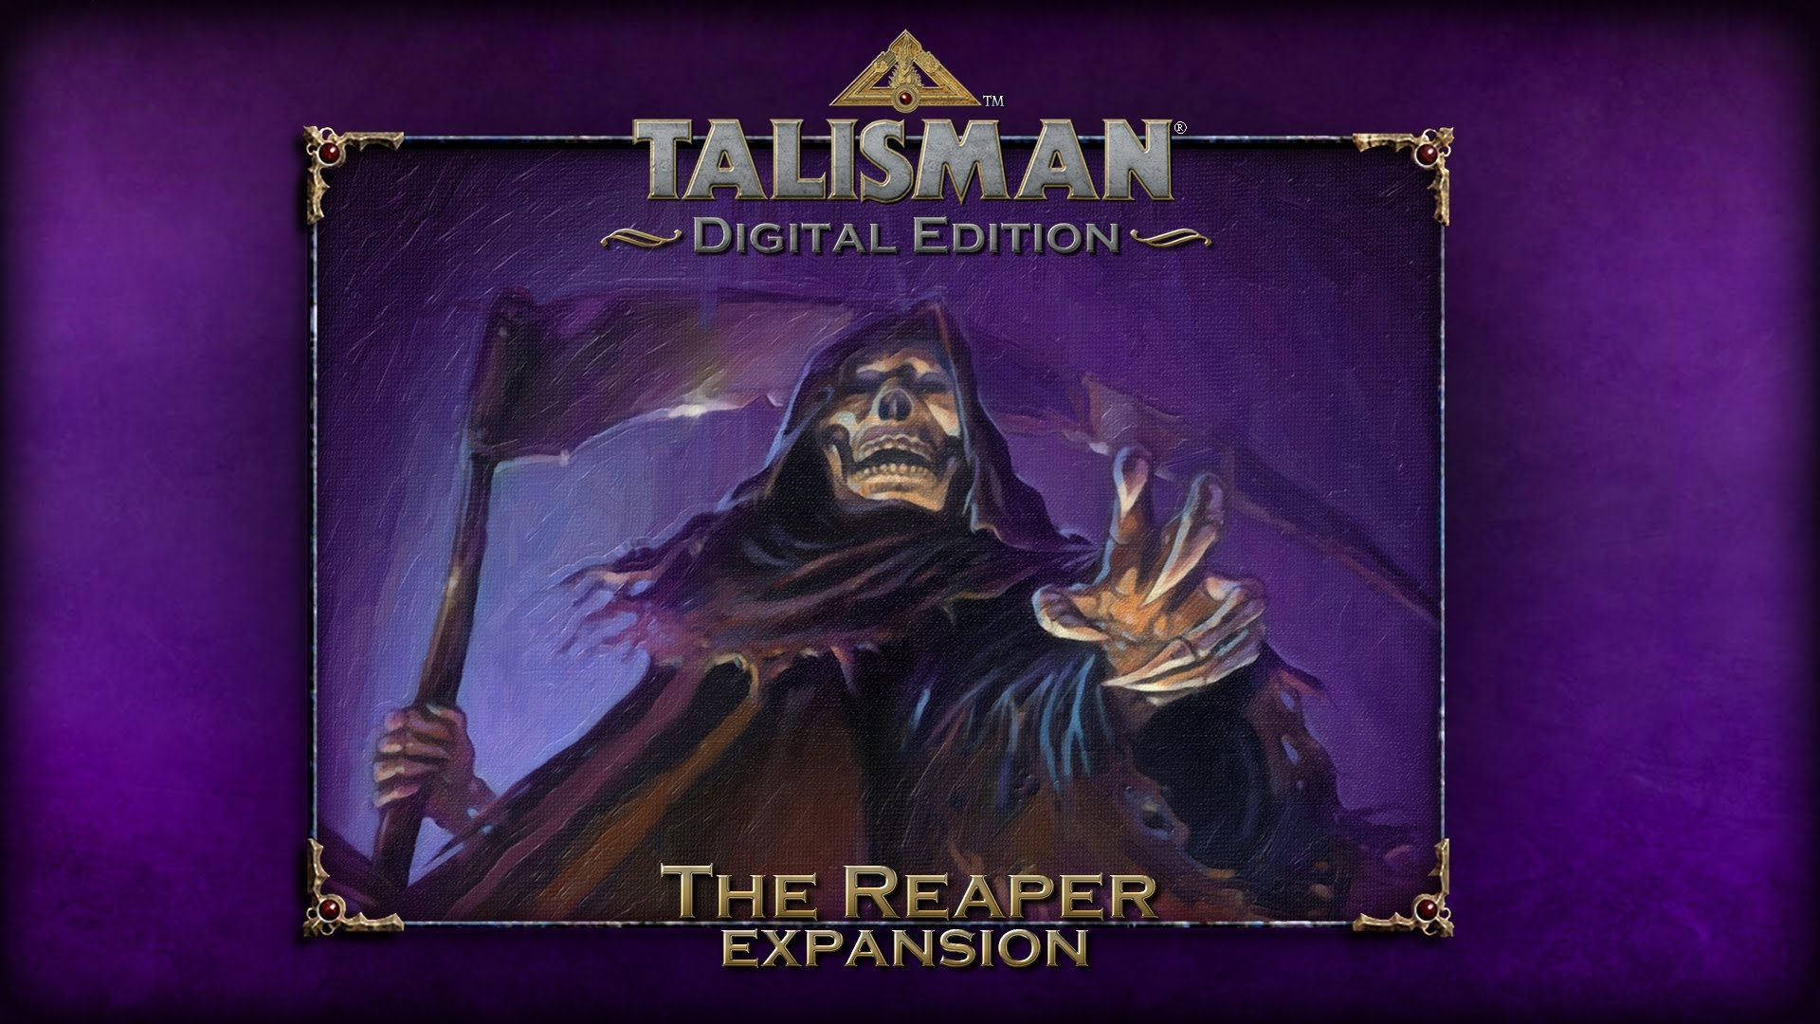 buy Talisman: Digital Edition - The Reaper cd key for all platform